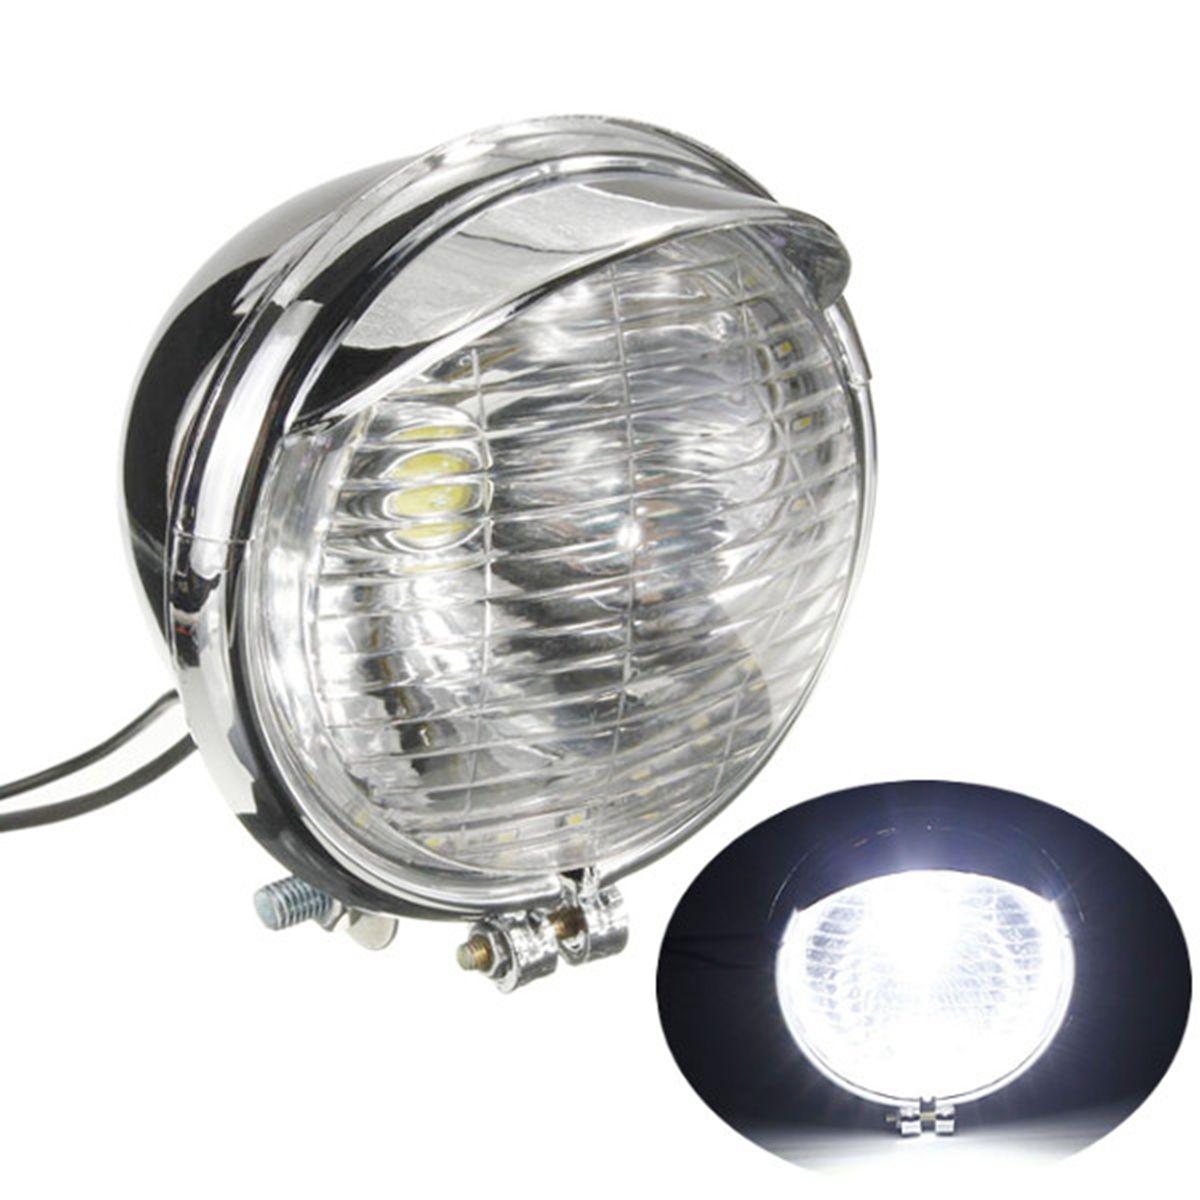 Universal Motorcycle 25 LED Headlight Head Lamp Chrome For Harley Chopper Custom 12V<br><br>Aliexpress